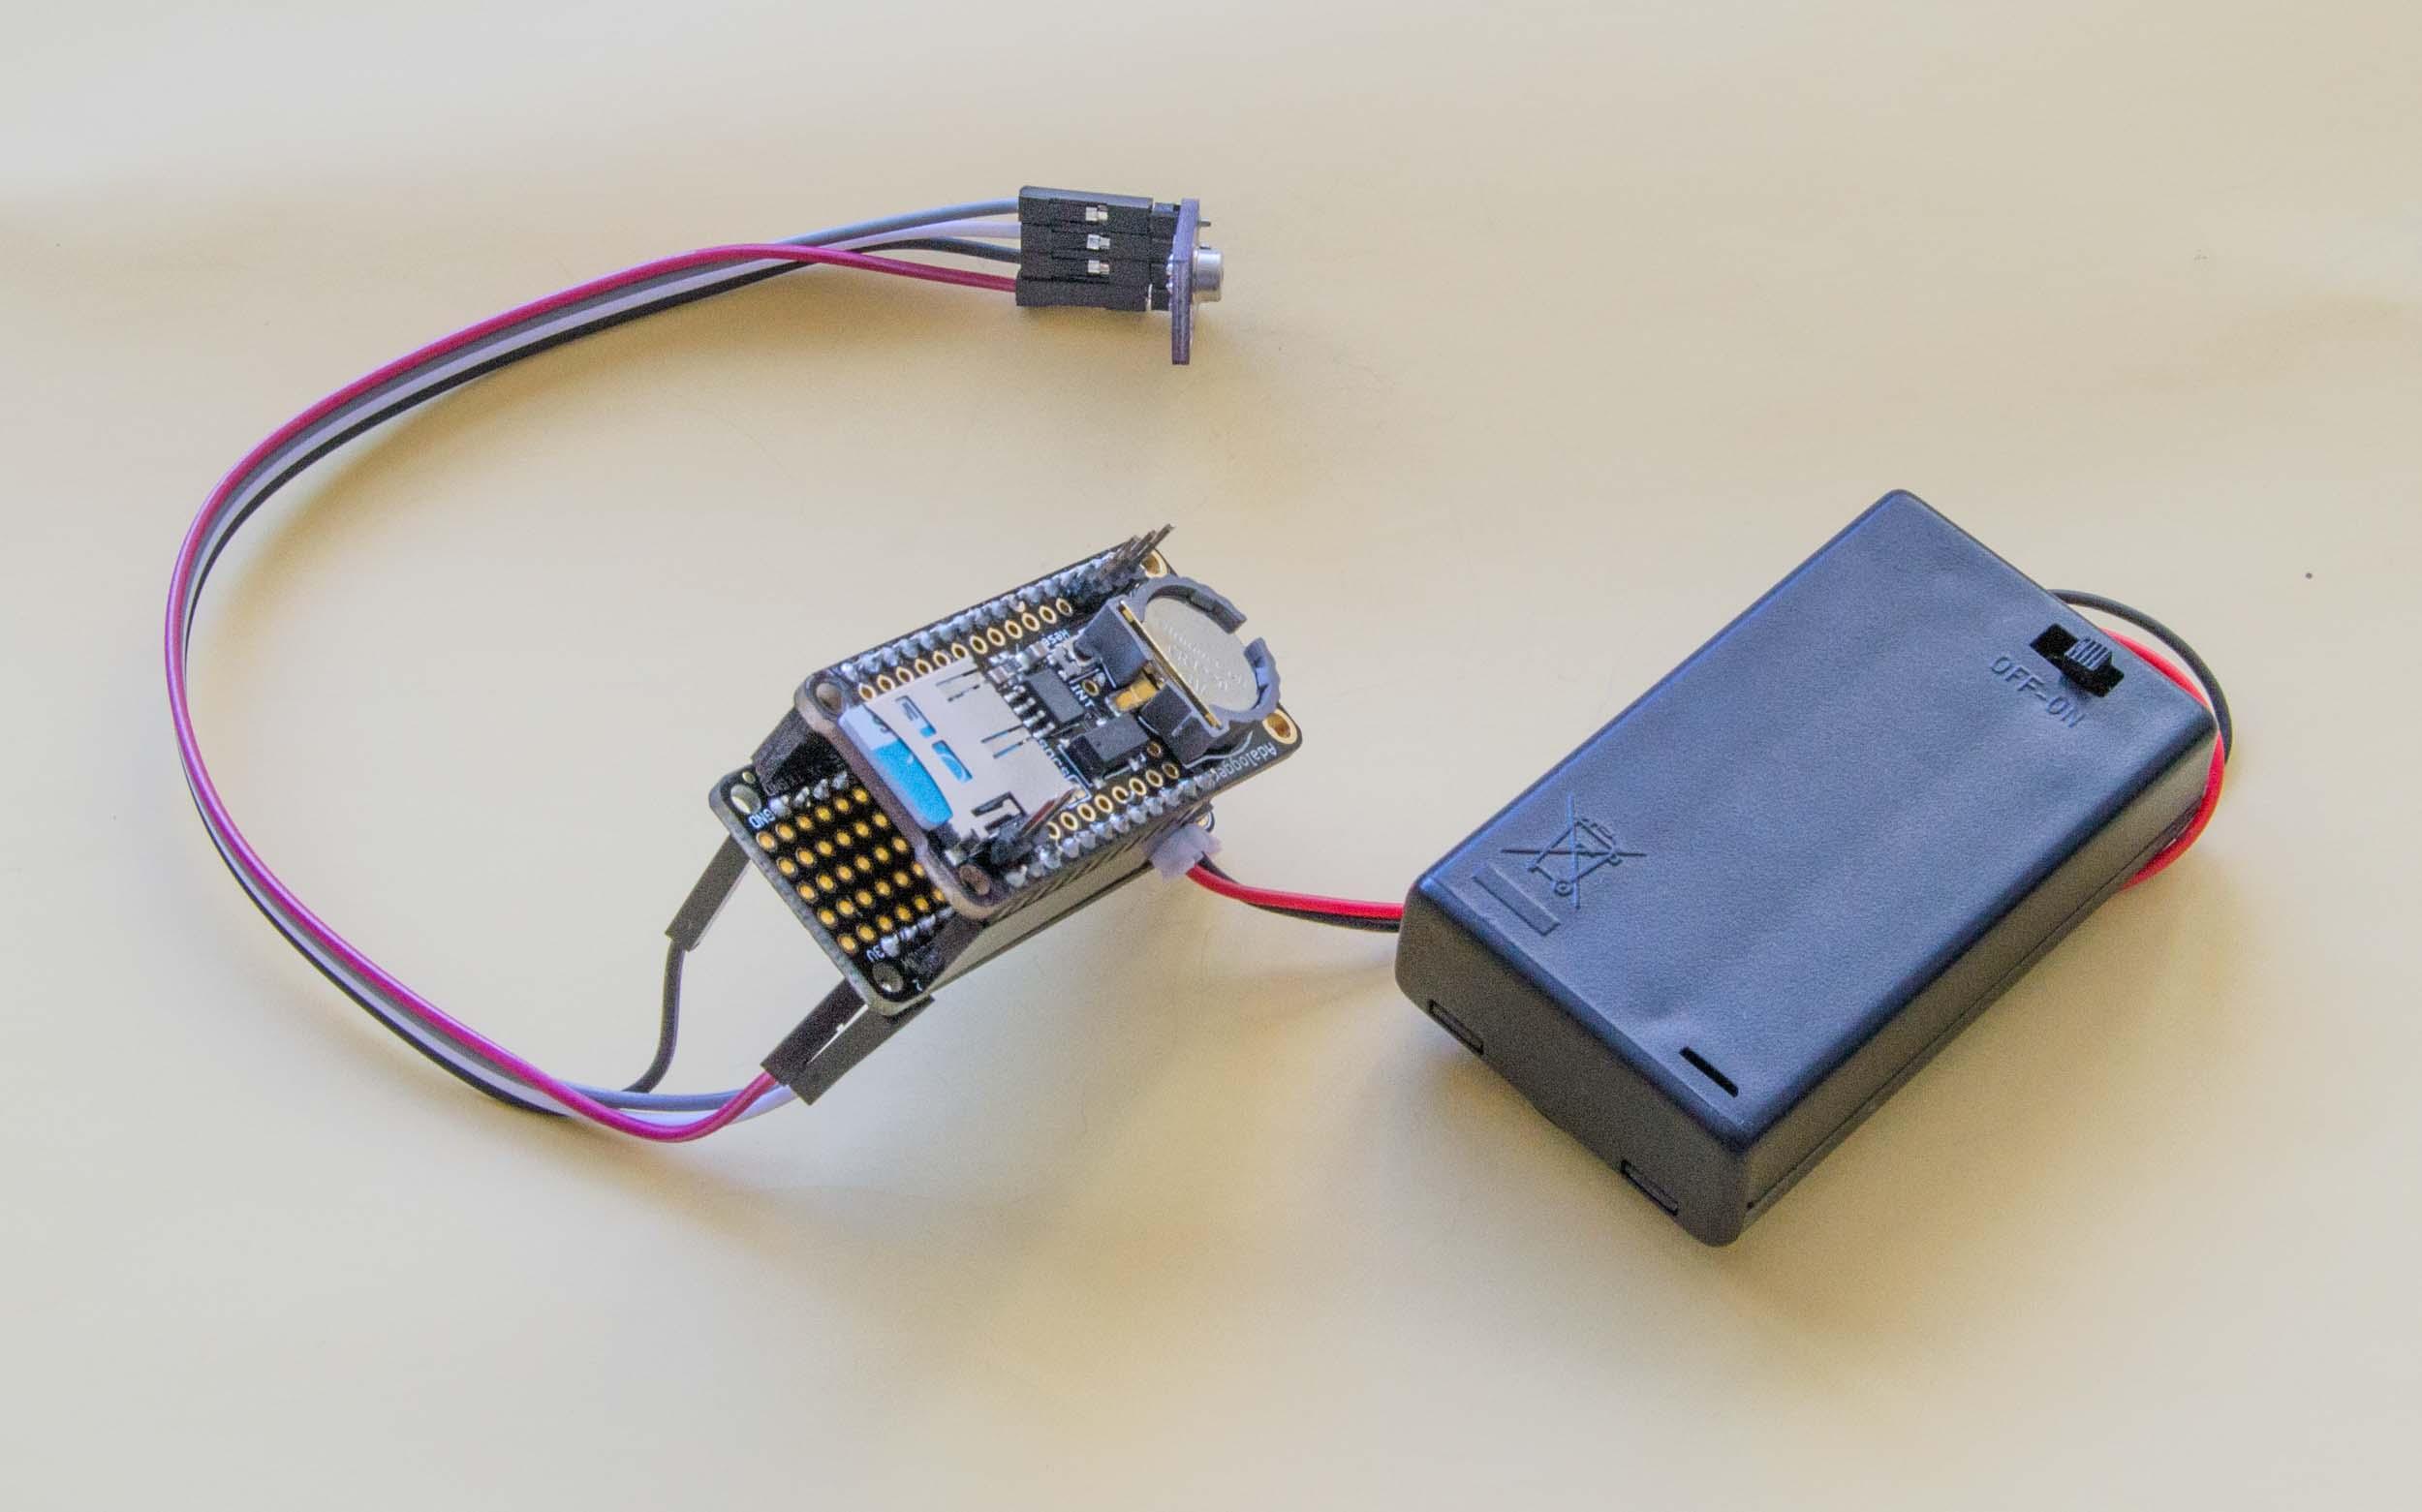 🎈 Public Lab: Adafruit Feathers for datalogging